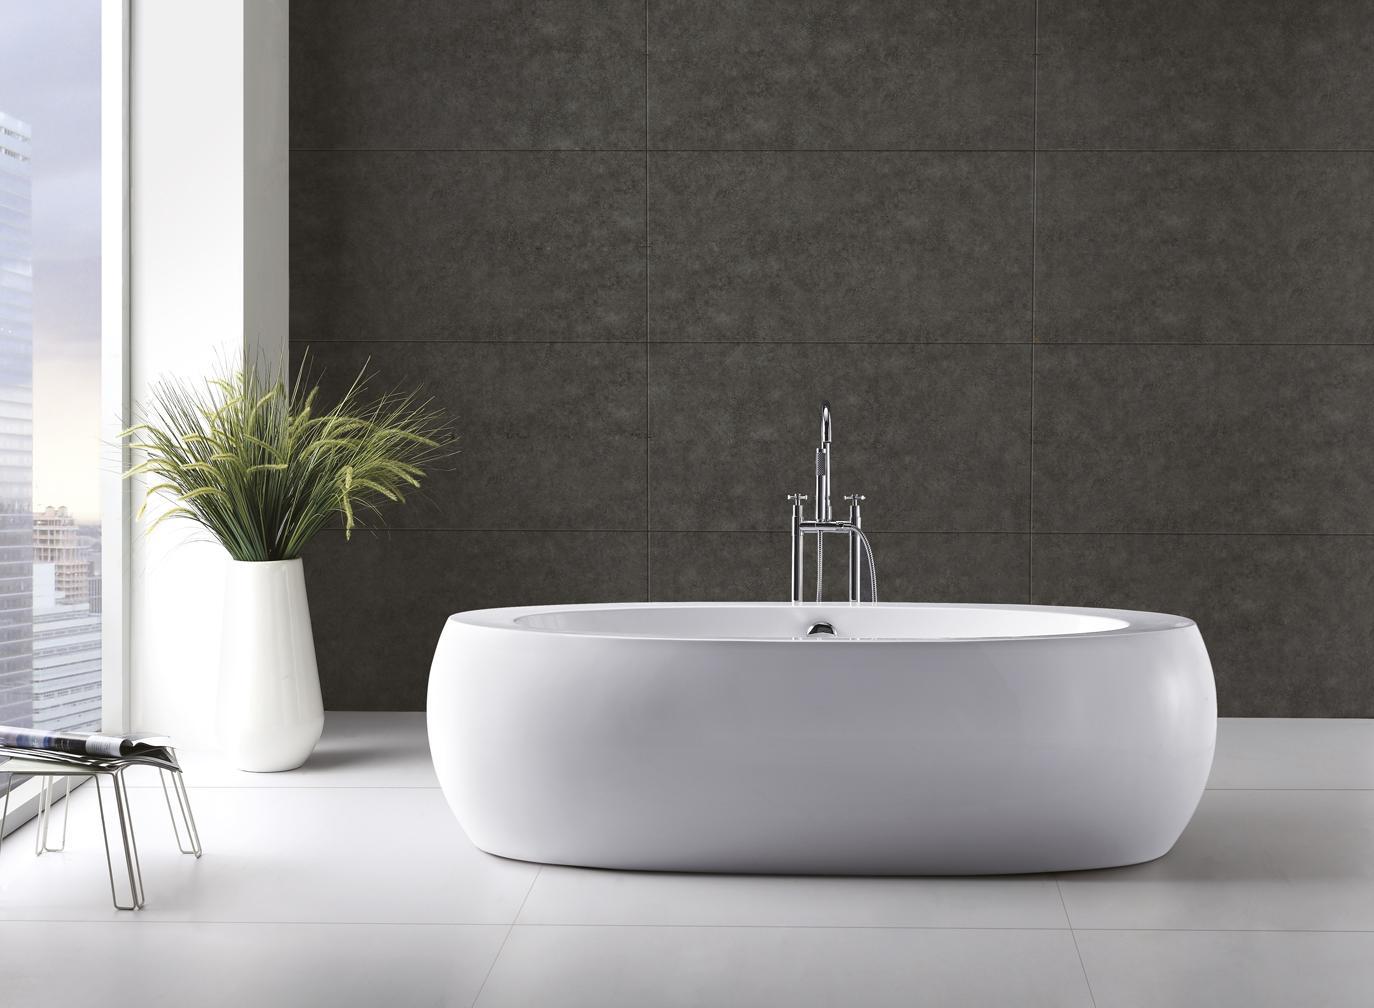 Vasca Da Bagno 150 80 : Vasche da bagno iperceramica